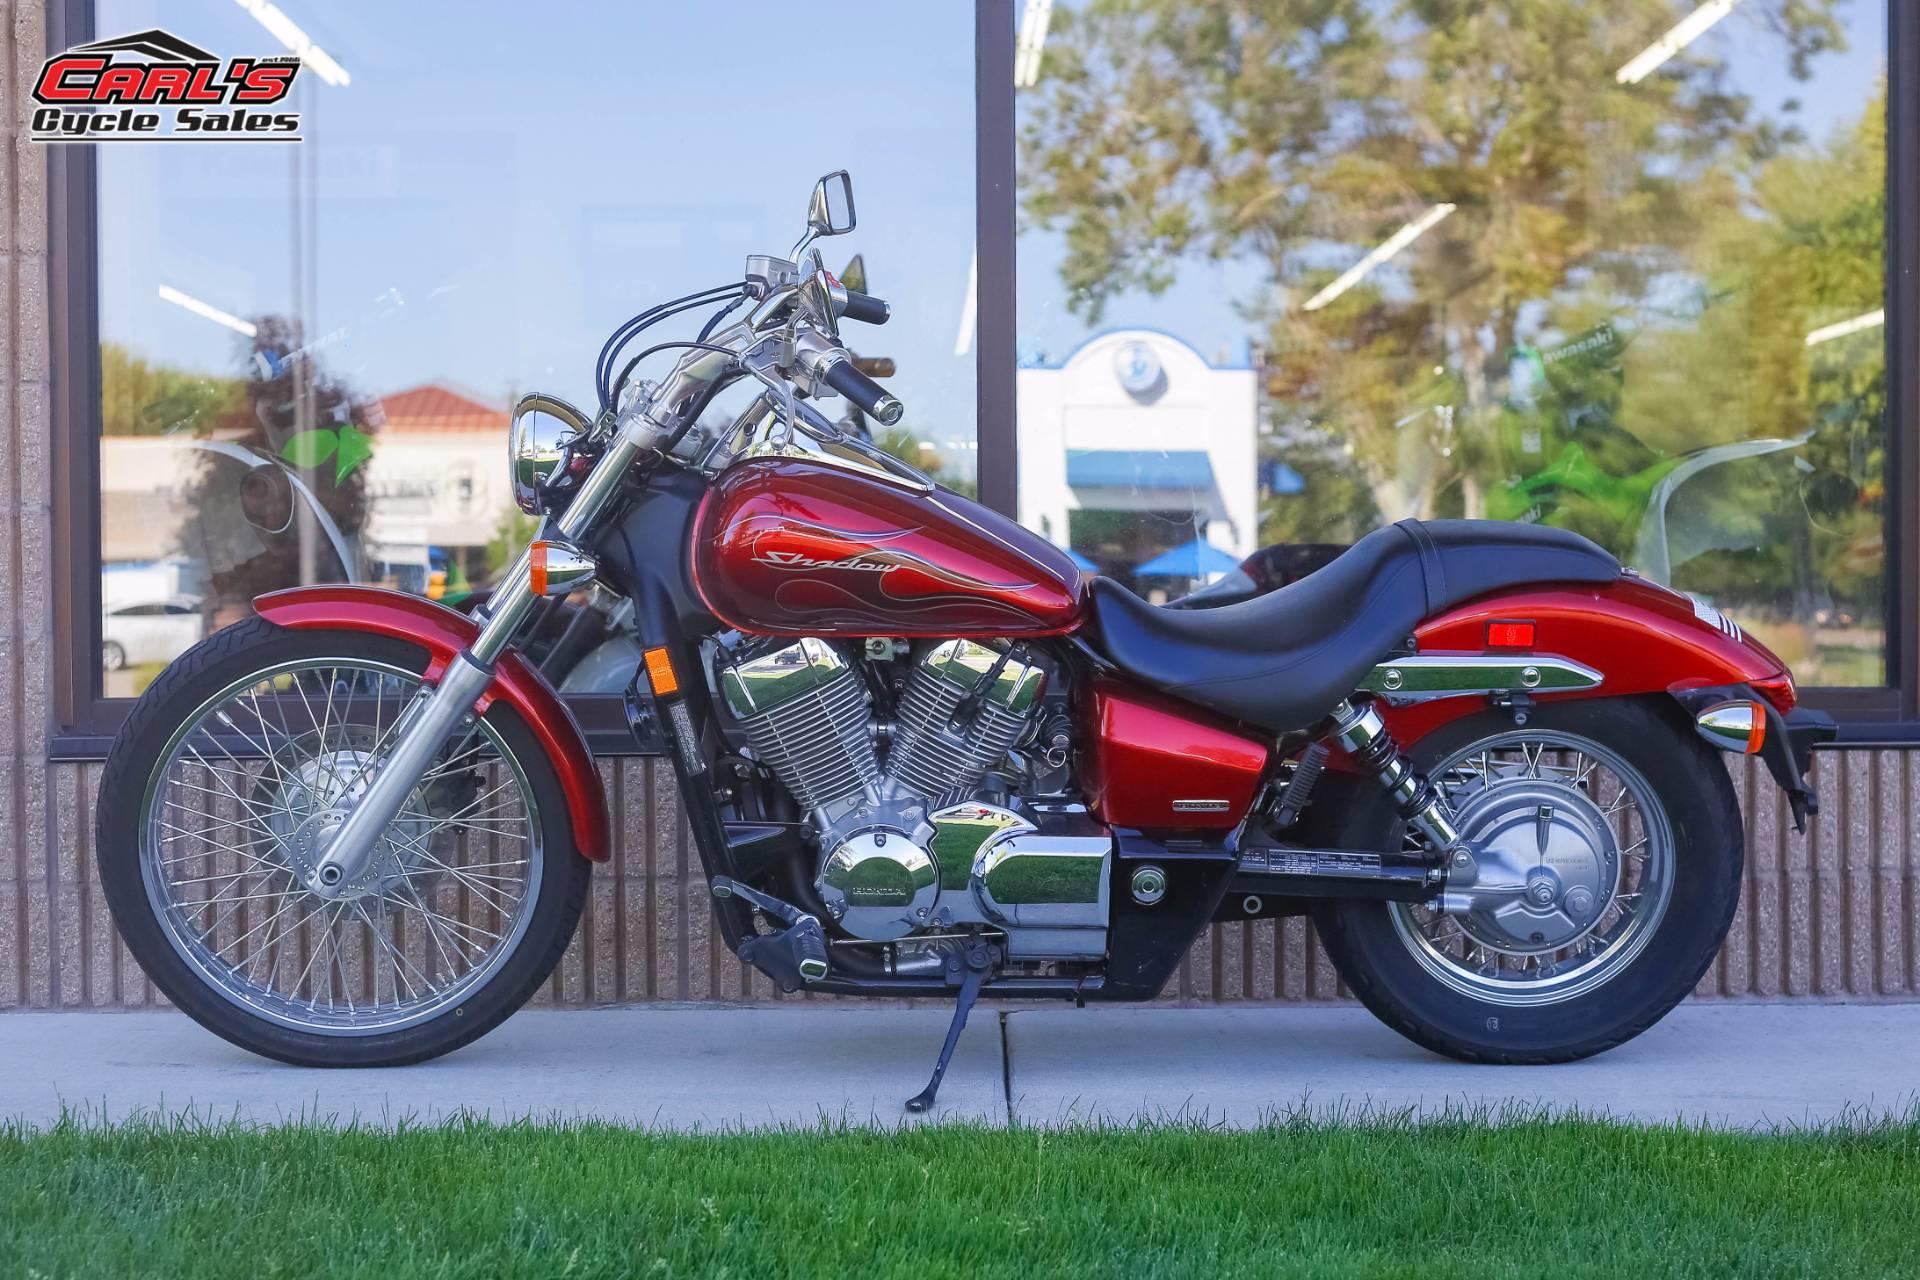 2008 Shadow Spirit 750